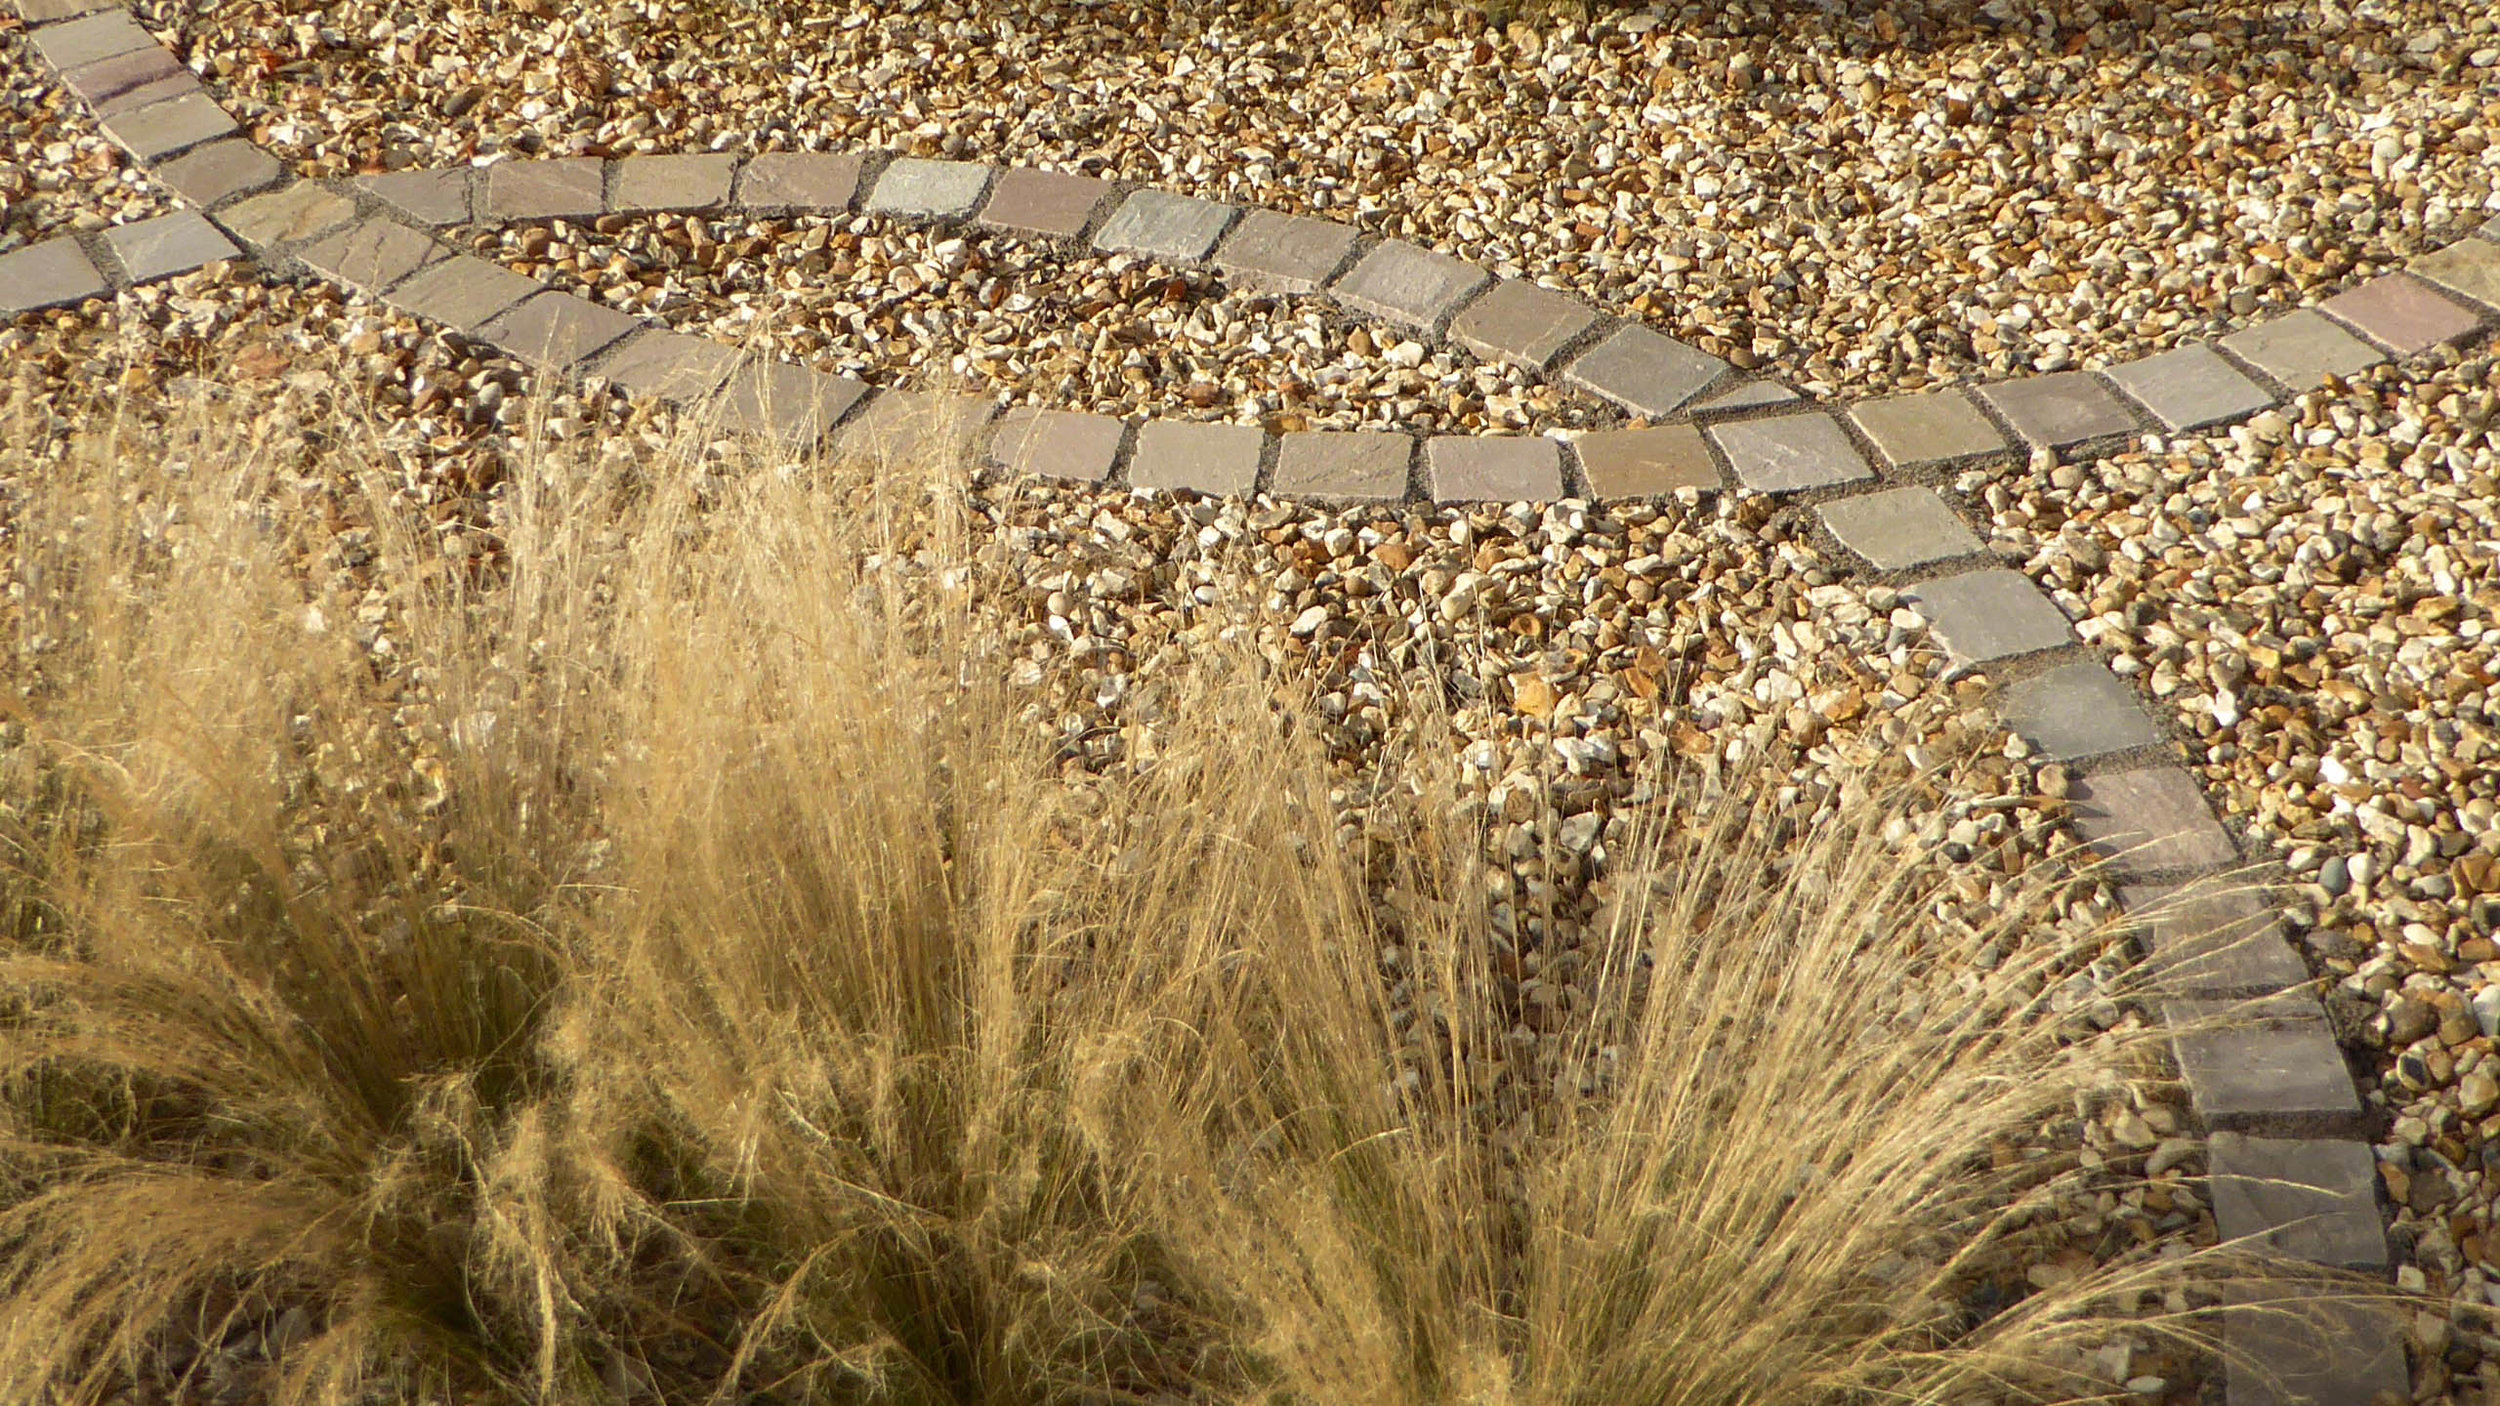 Cheshire Garden Design: Interlocking Curves and Acer